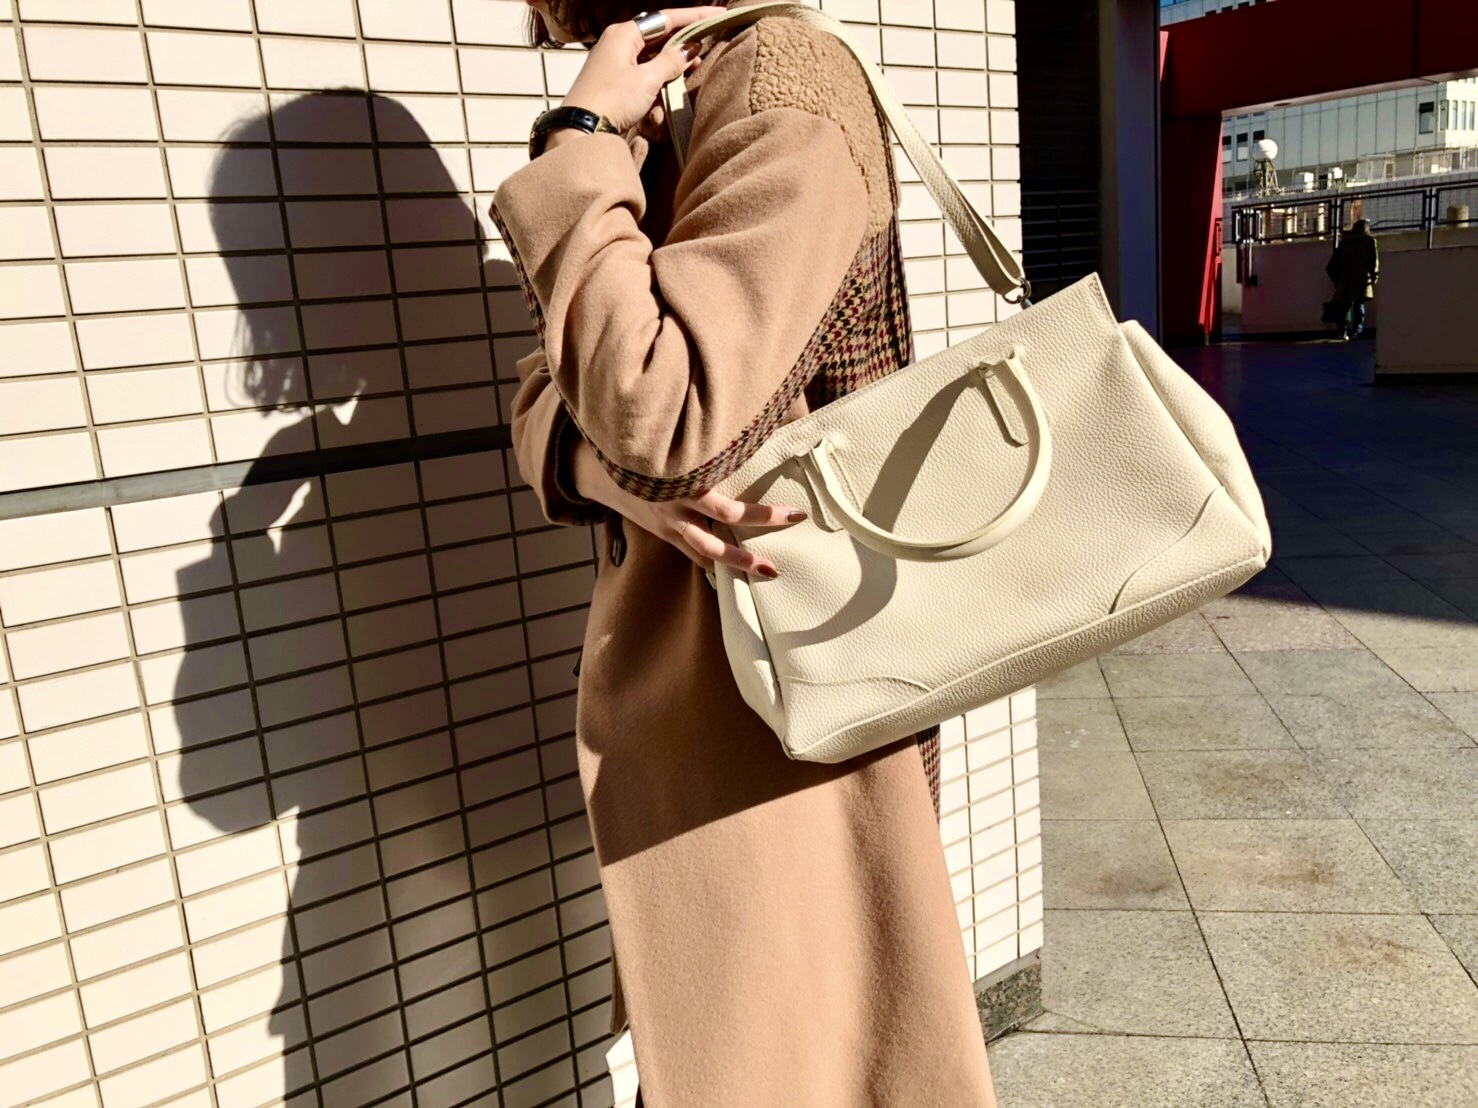 MILOS ミロス scrapbook スクラップ ブック バッグ bag トートバッグ 牛革 東武池袋 池袋東武 東武百貨店